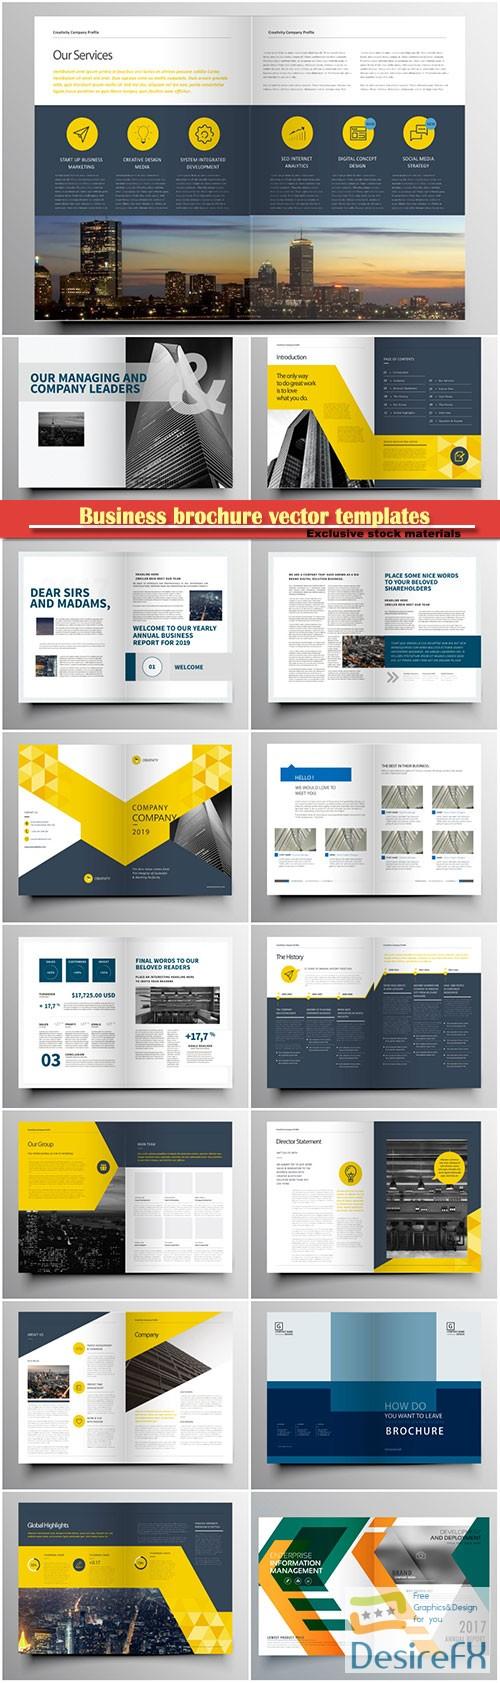 Business brochure vector templates